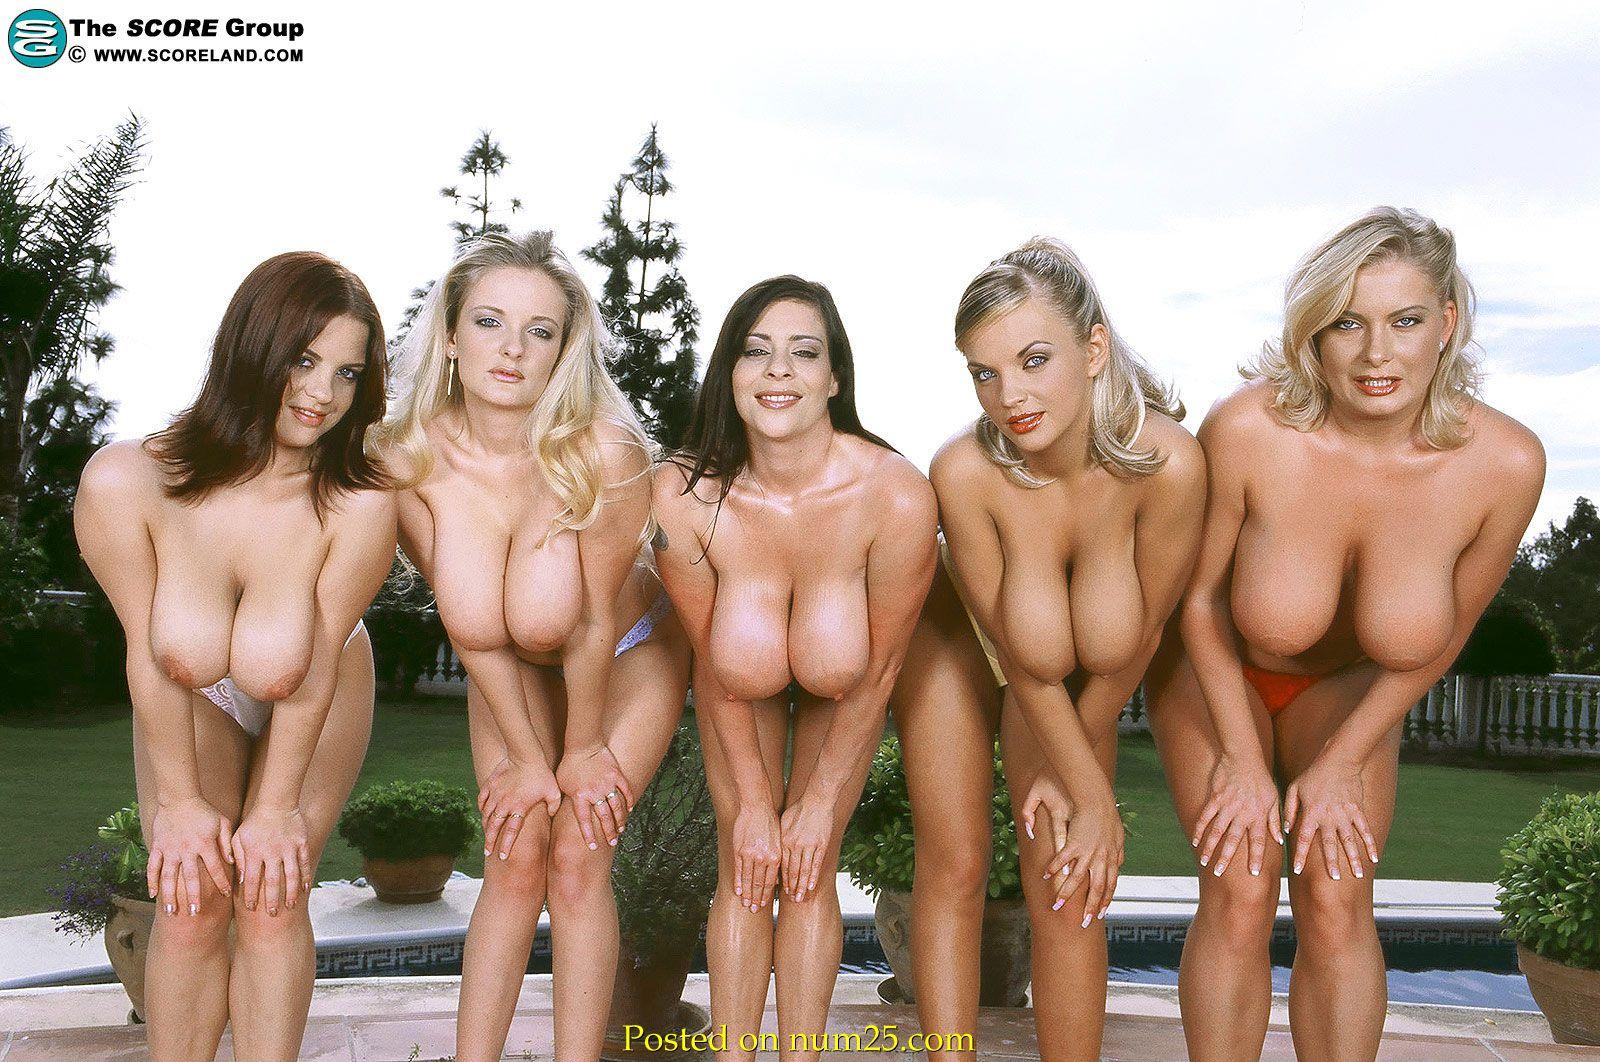 ogromnie-siski-grupp-porno